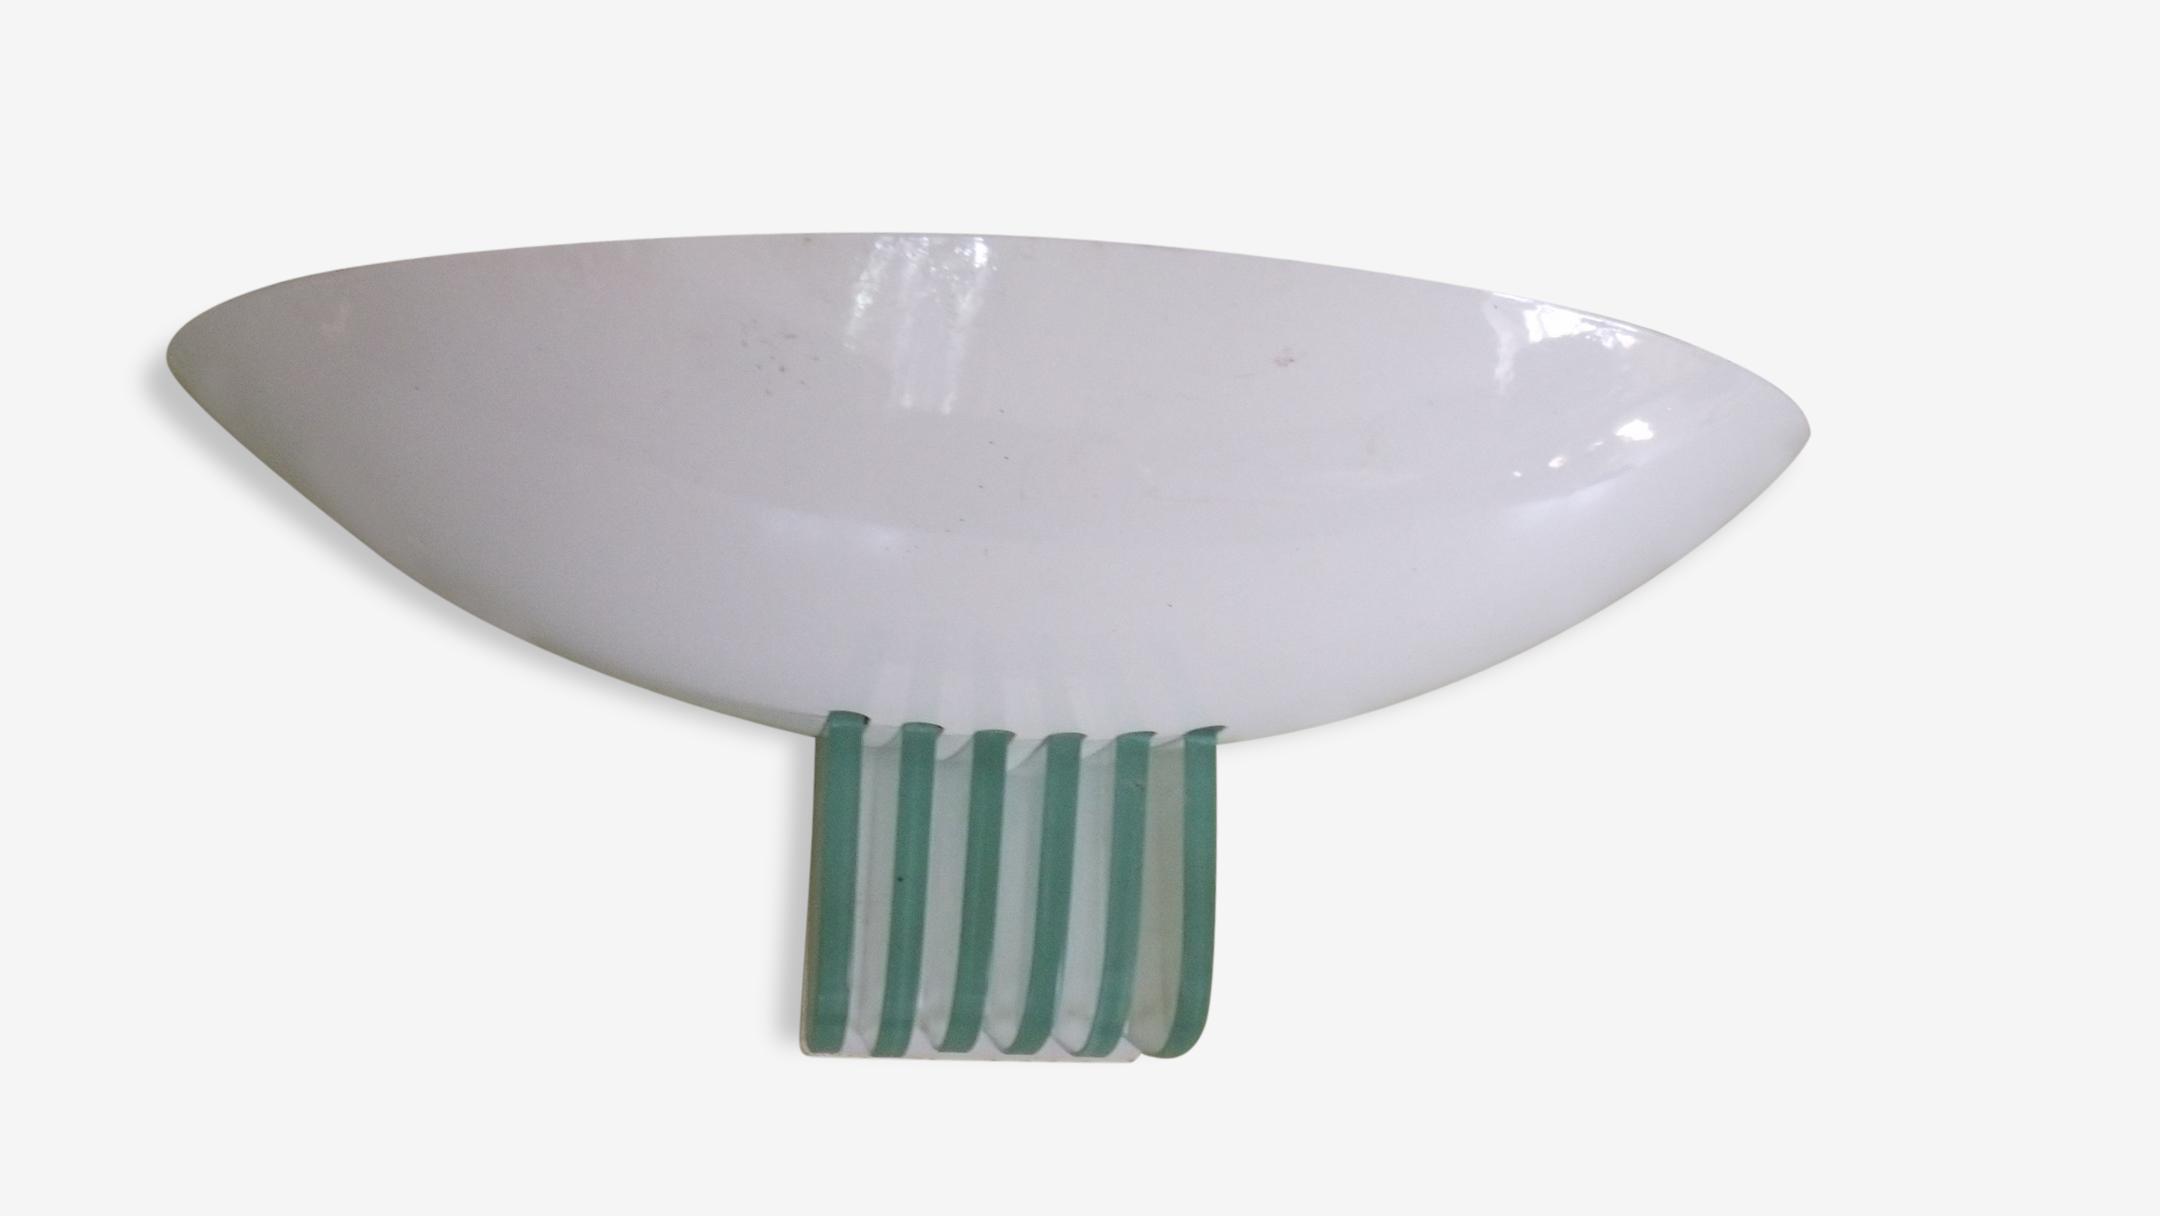 Applique métal et verre type Perzel